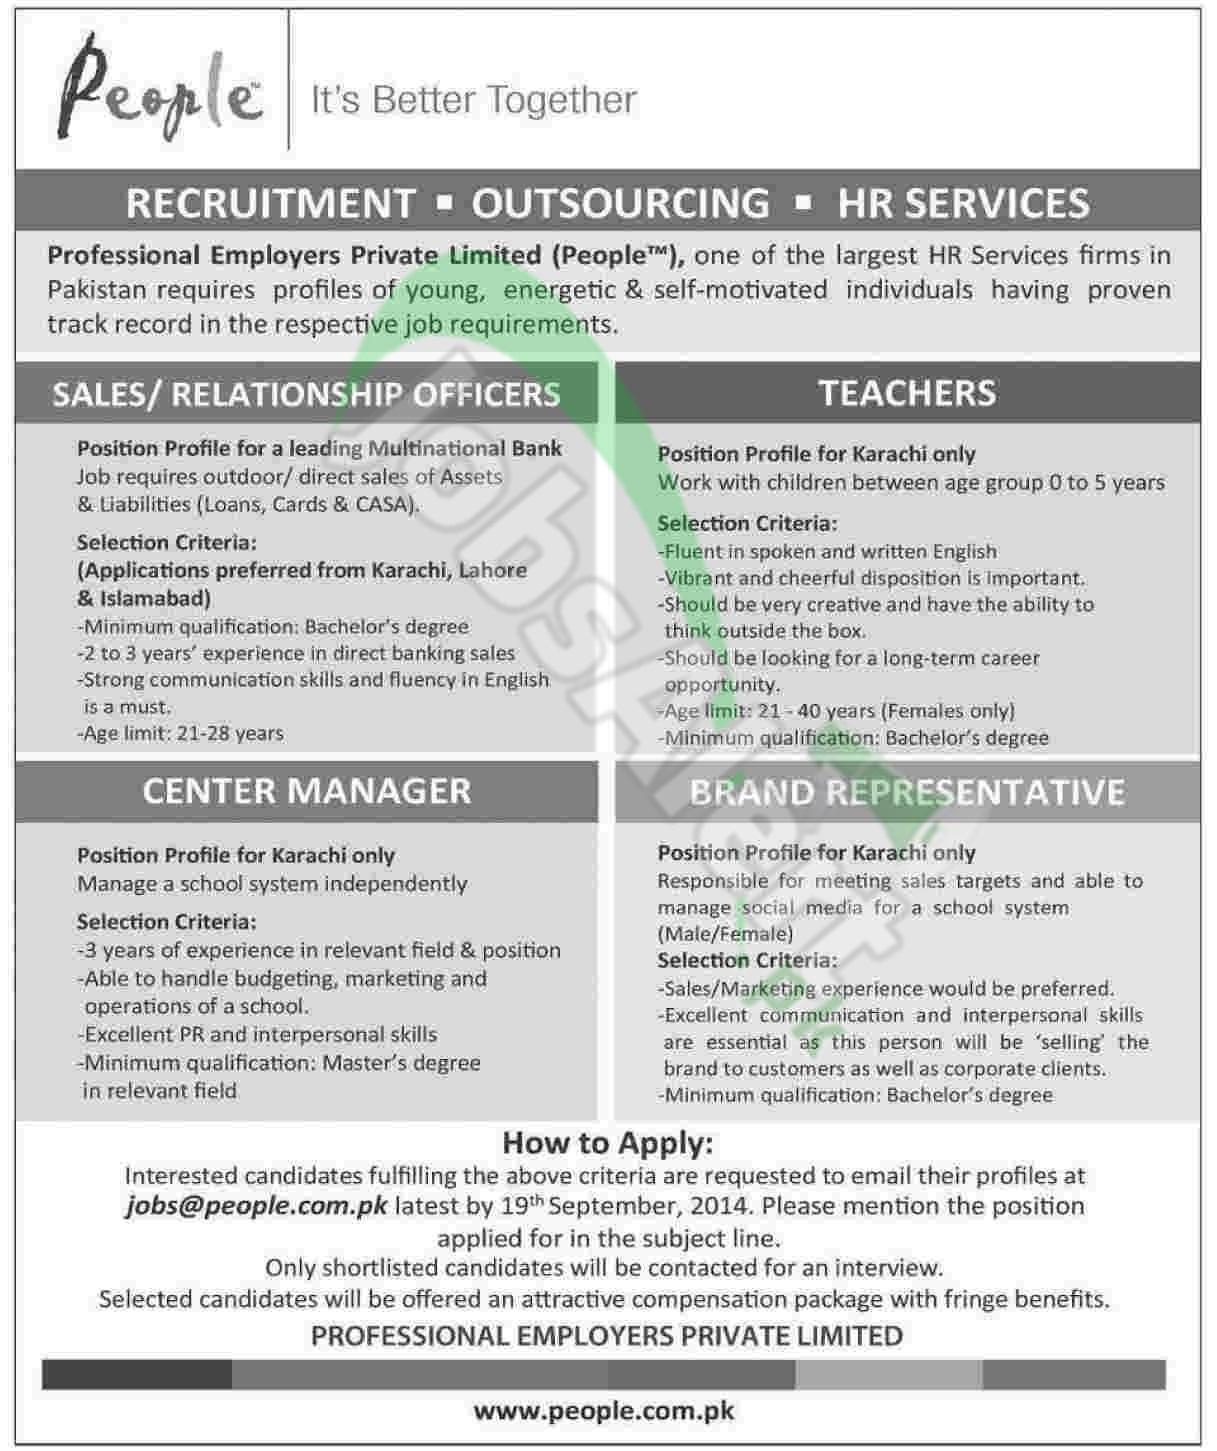 Professional Employers Pvt Ltd